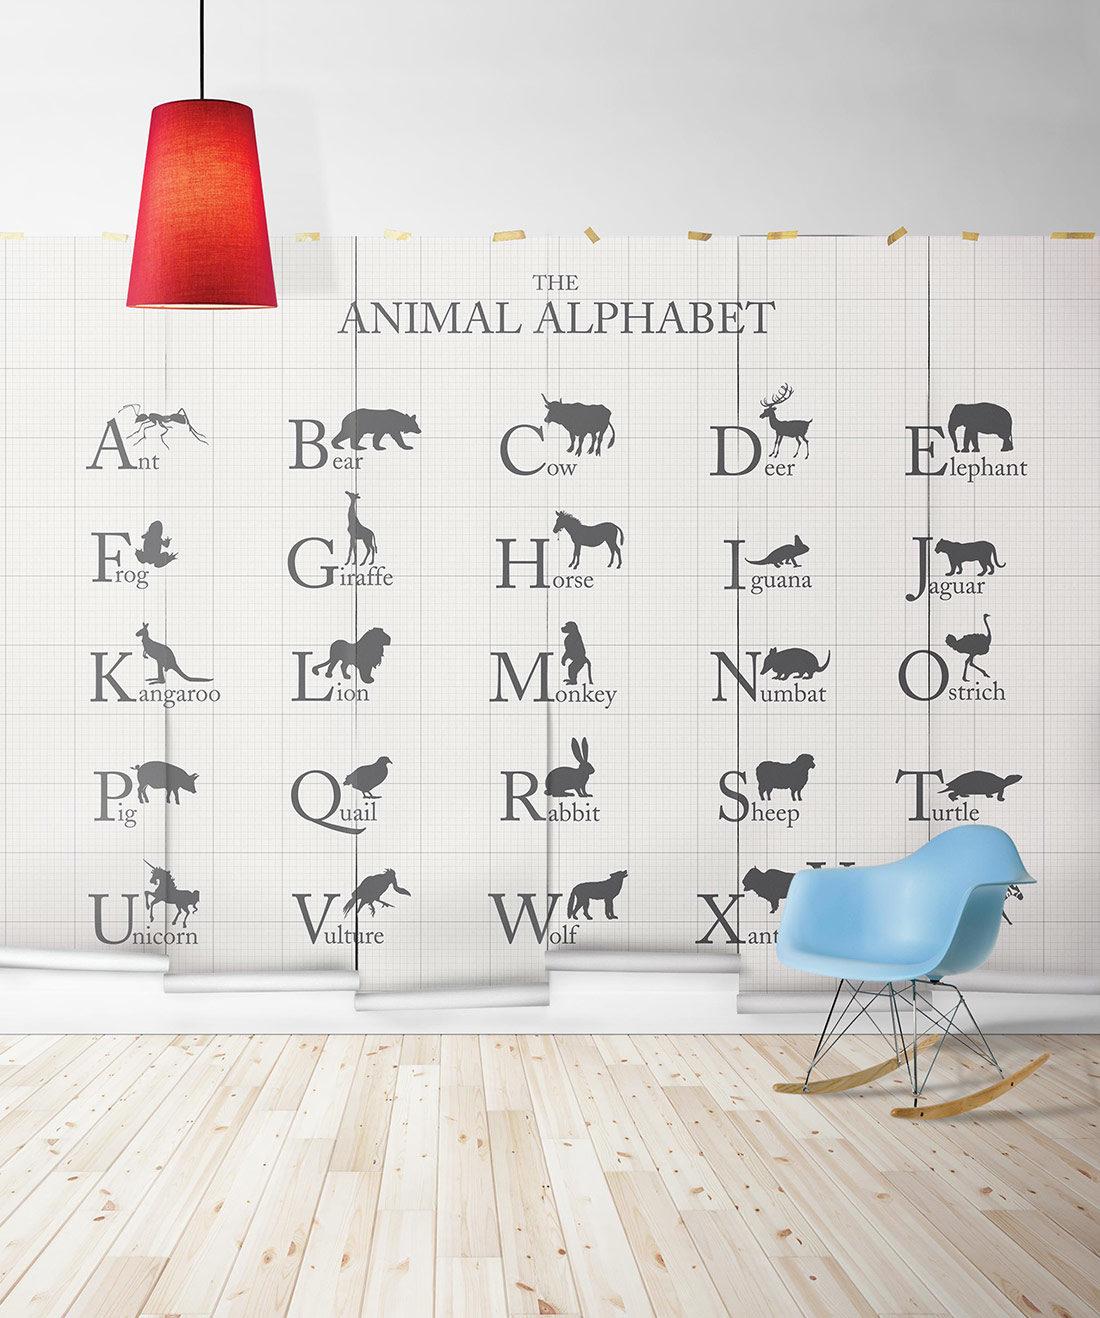 Animal Alphabet Wall Mural - Milton & King